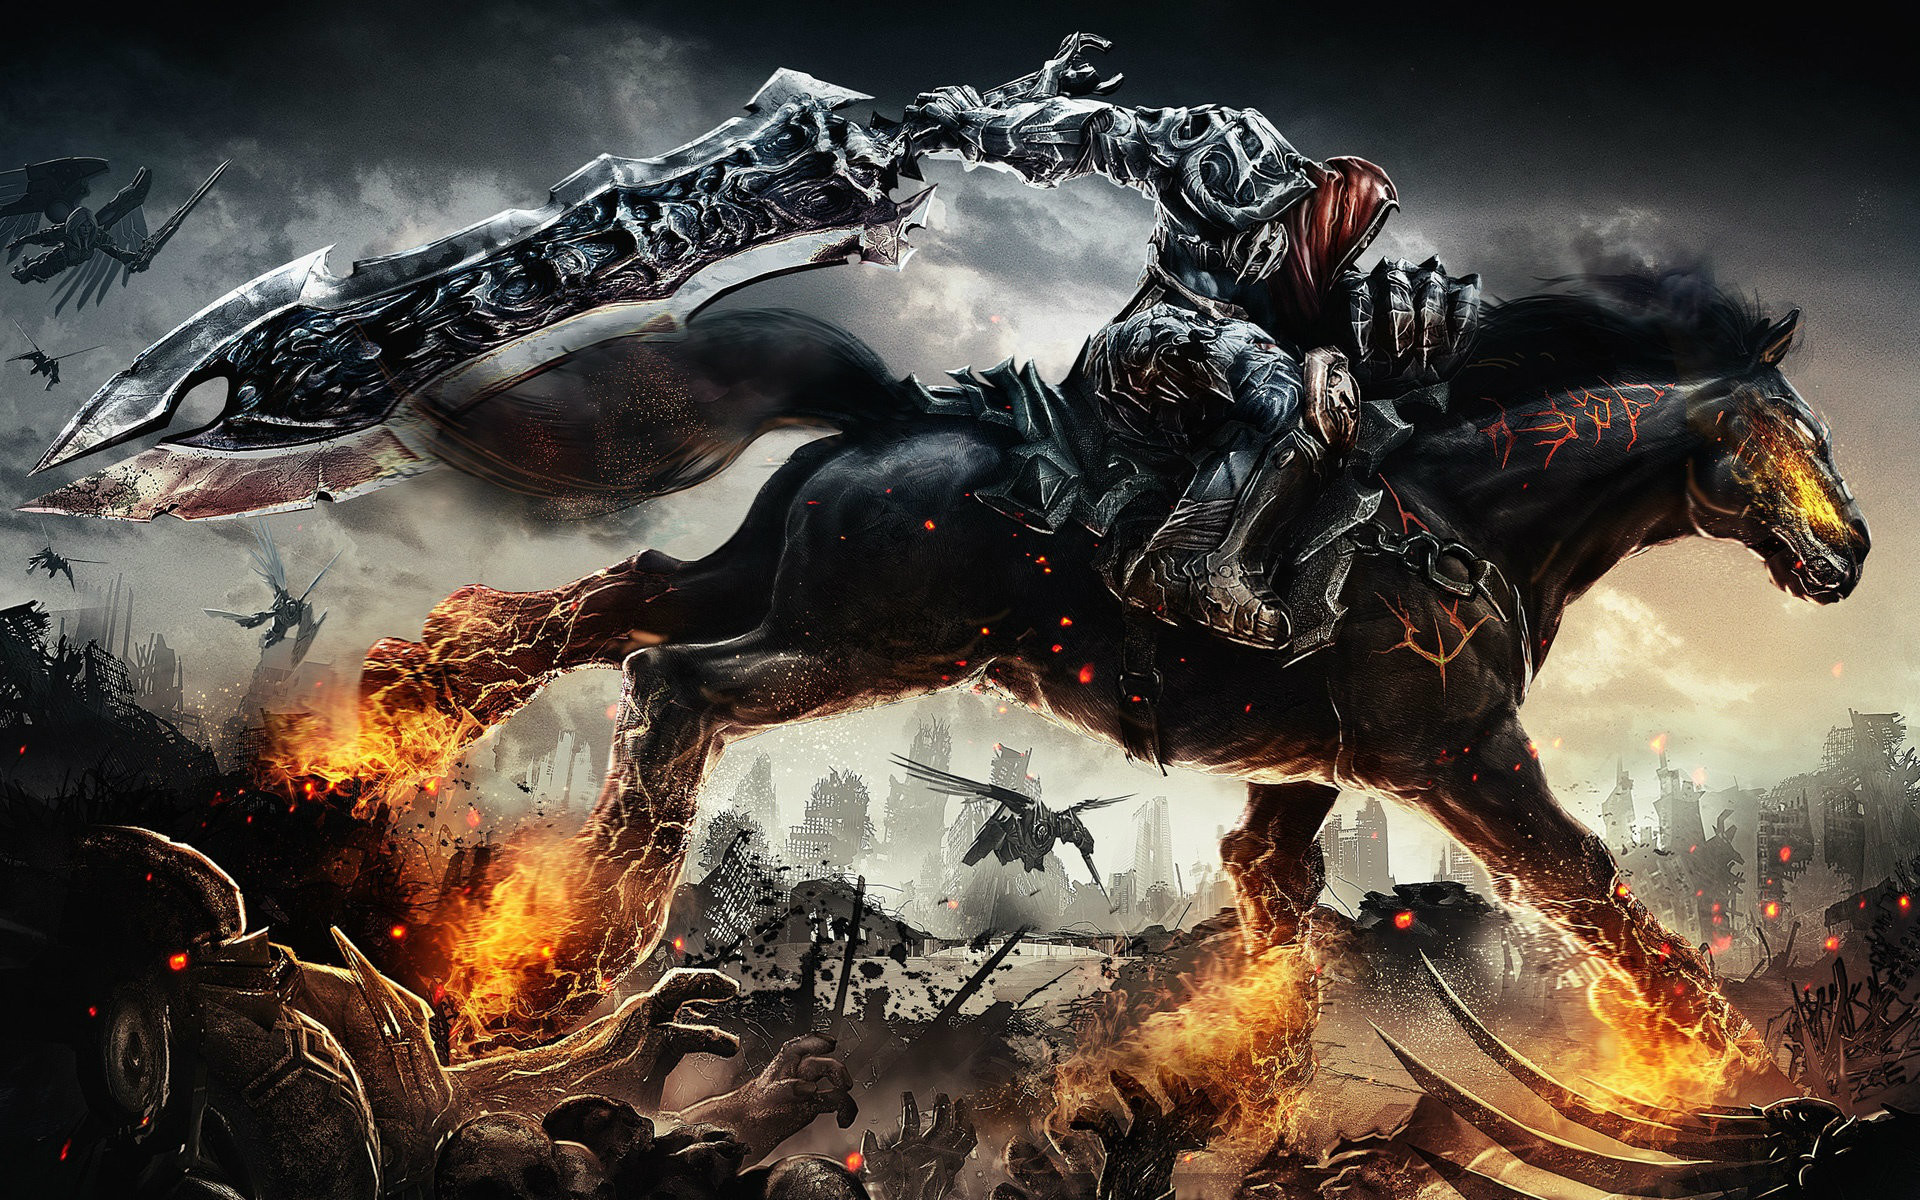 Action Games Wallpaper HD 1080p